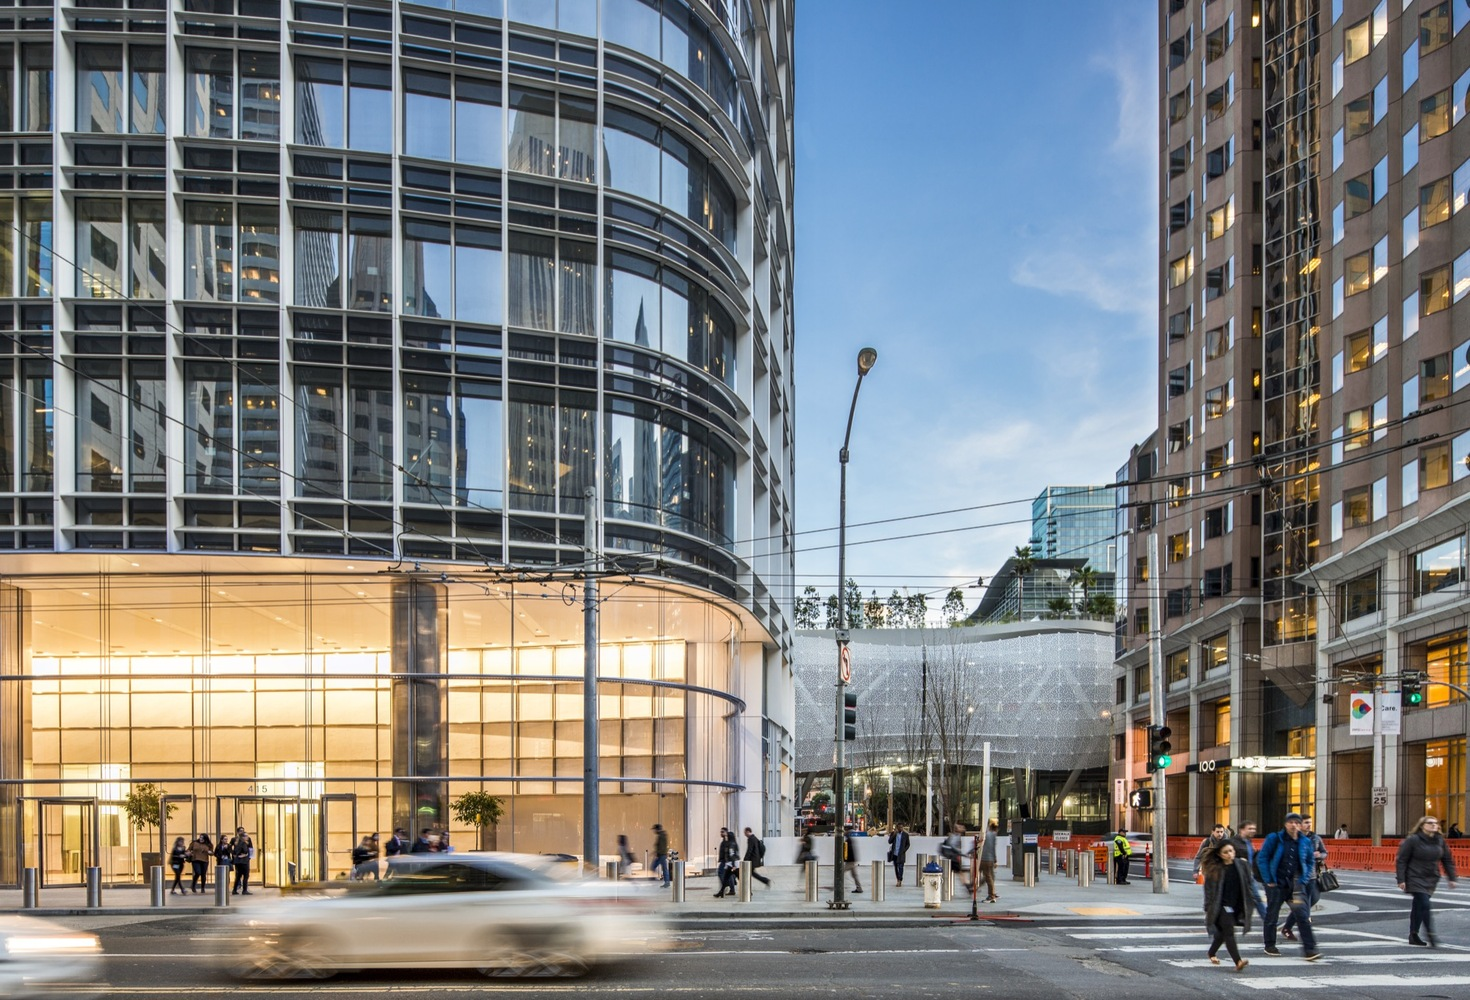 Salesforce Tower - Pelli Clarke Pelli Architects - IGS Magazine - Projects - 2